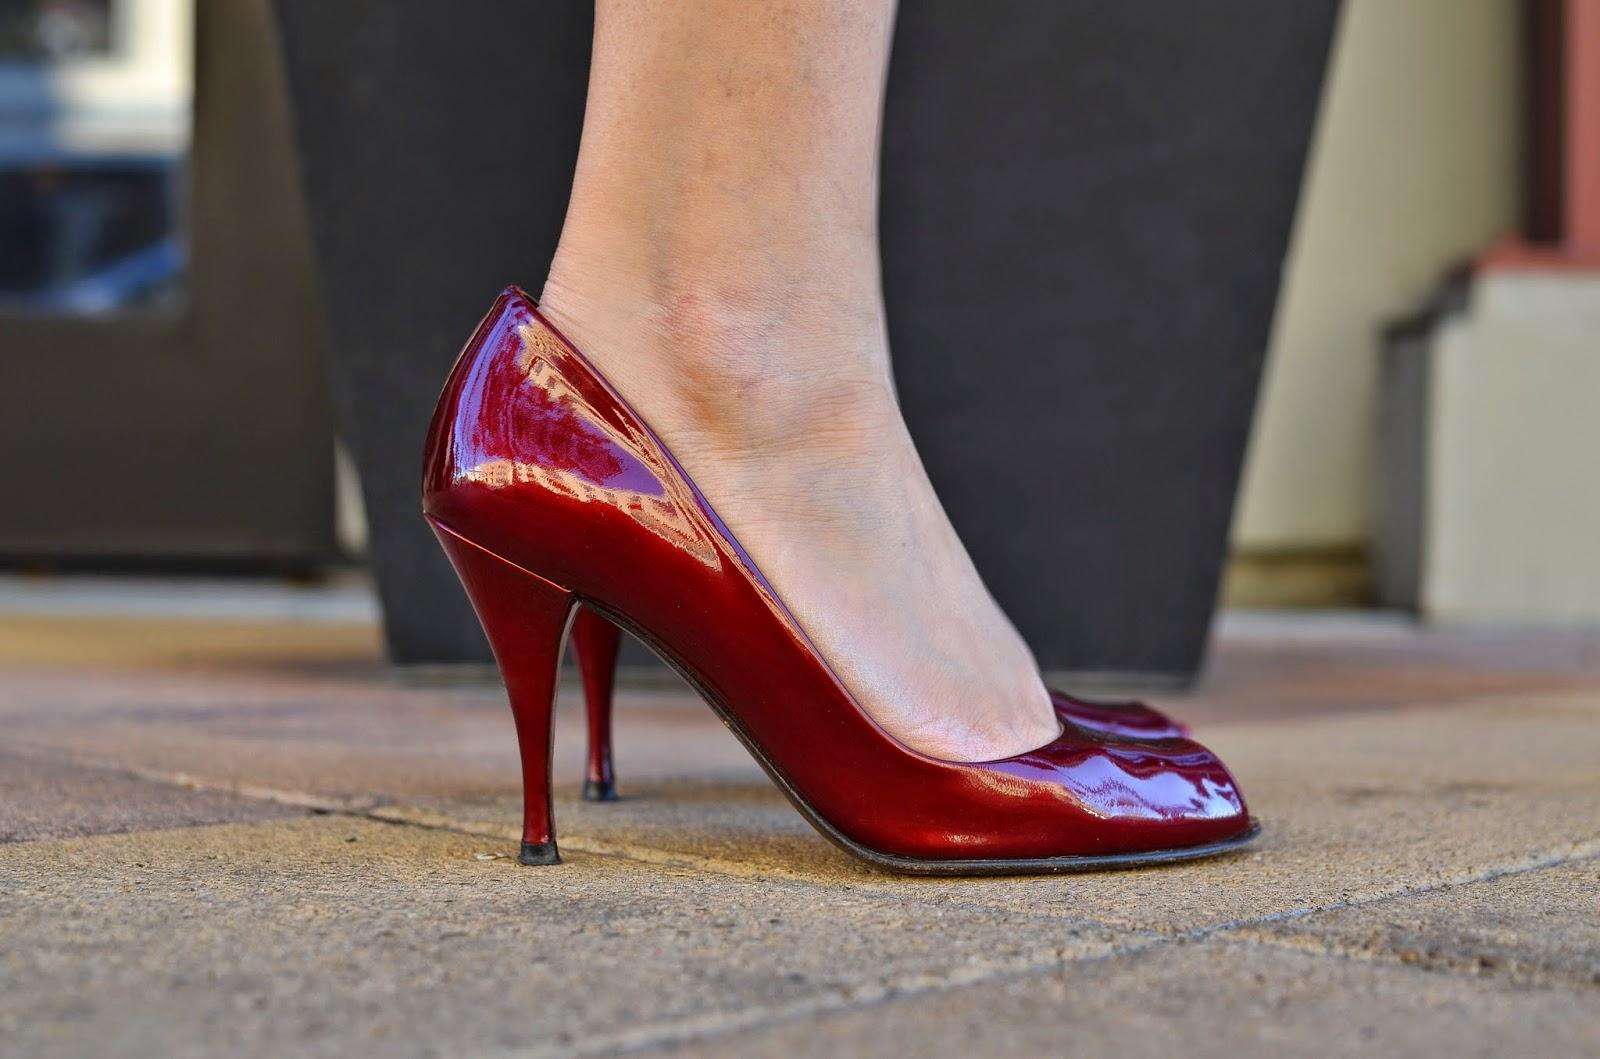 Maroon Stuart Weitzman Peep Toe Heels